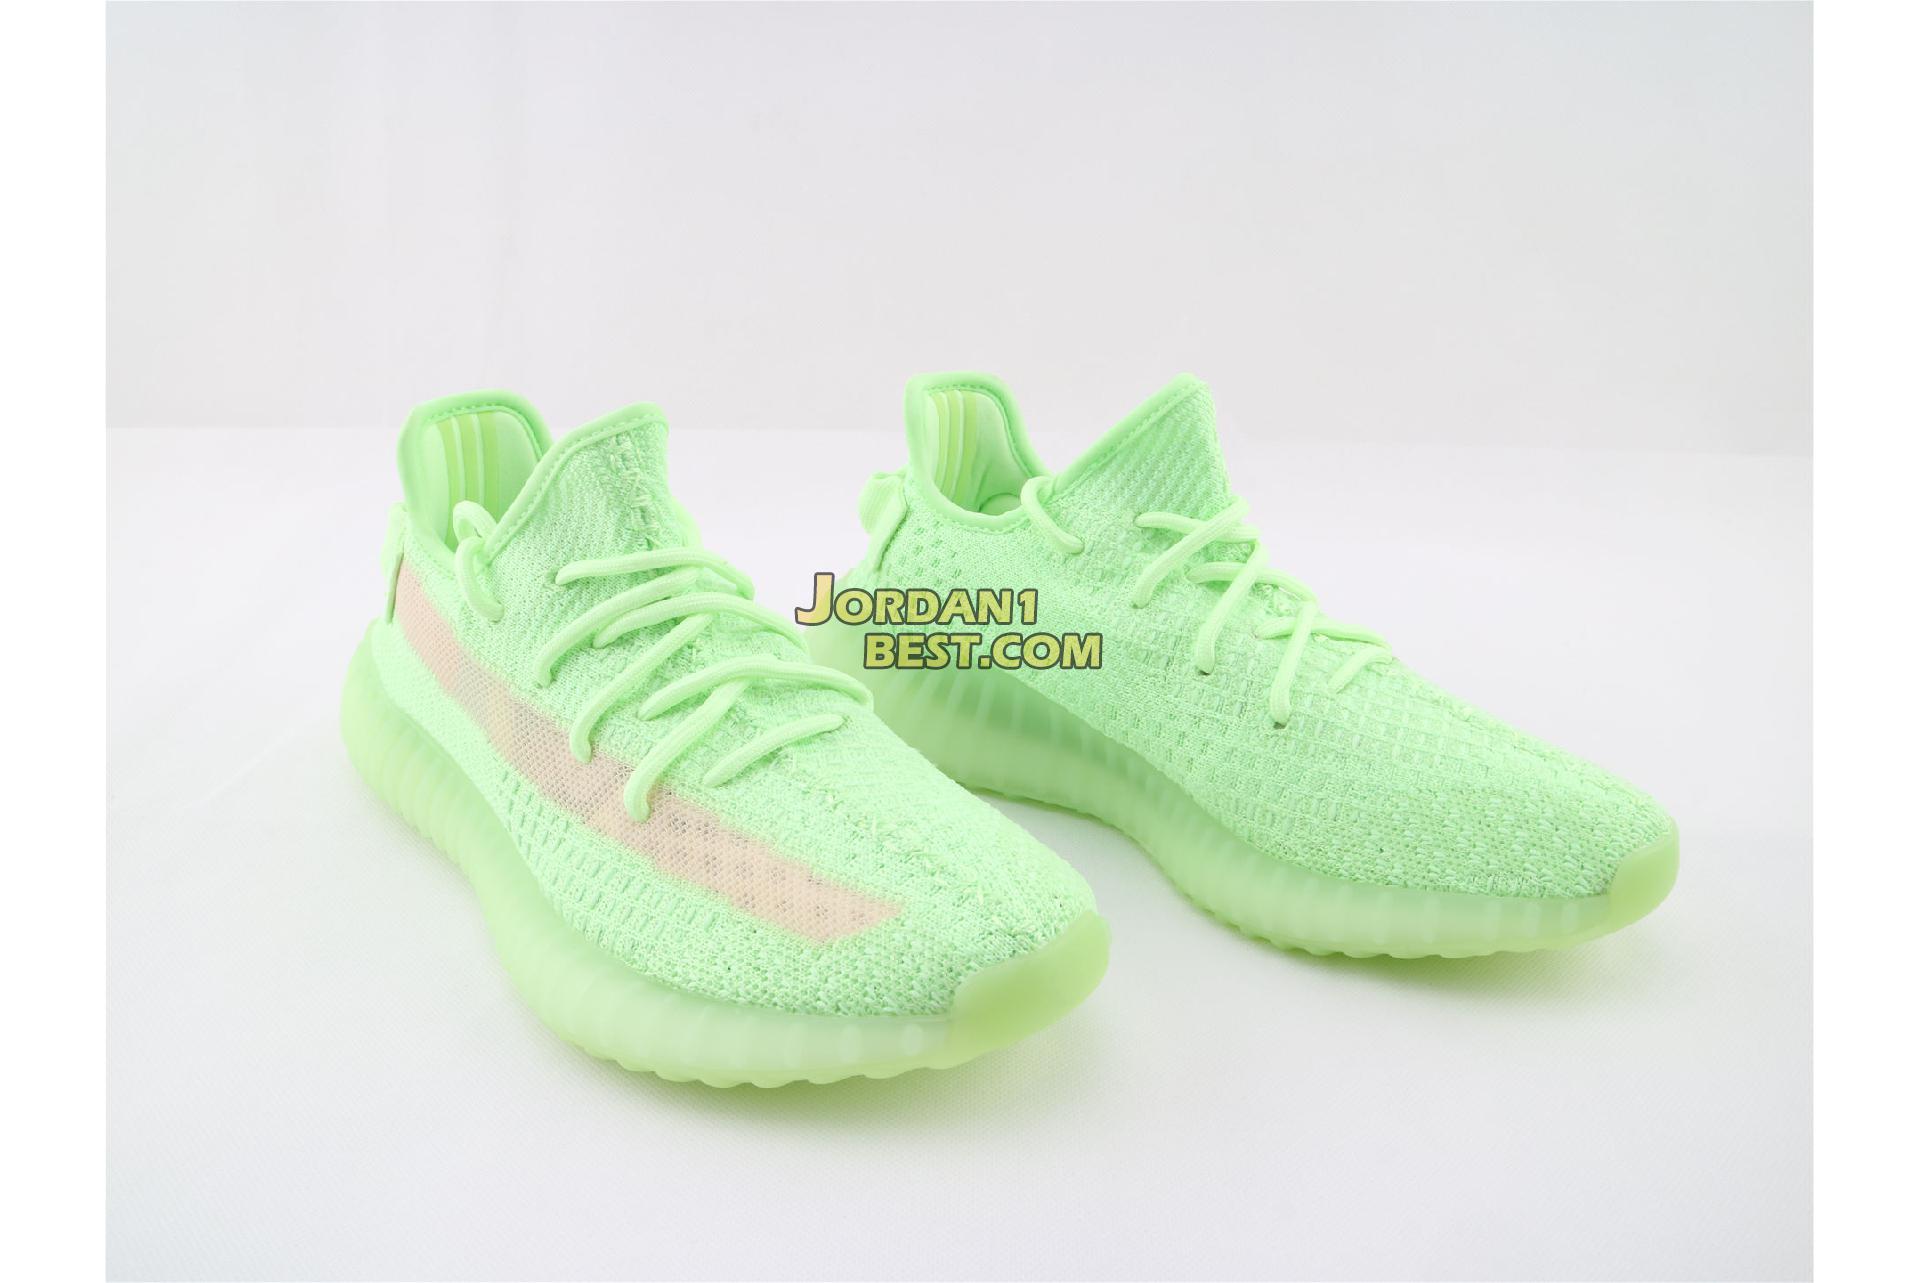 "Adidas Yeezy Boost 350 V2 ""Glow in the Dark"" EG5293"